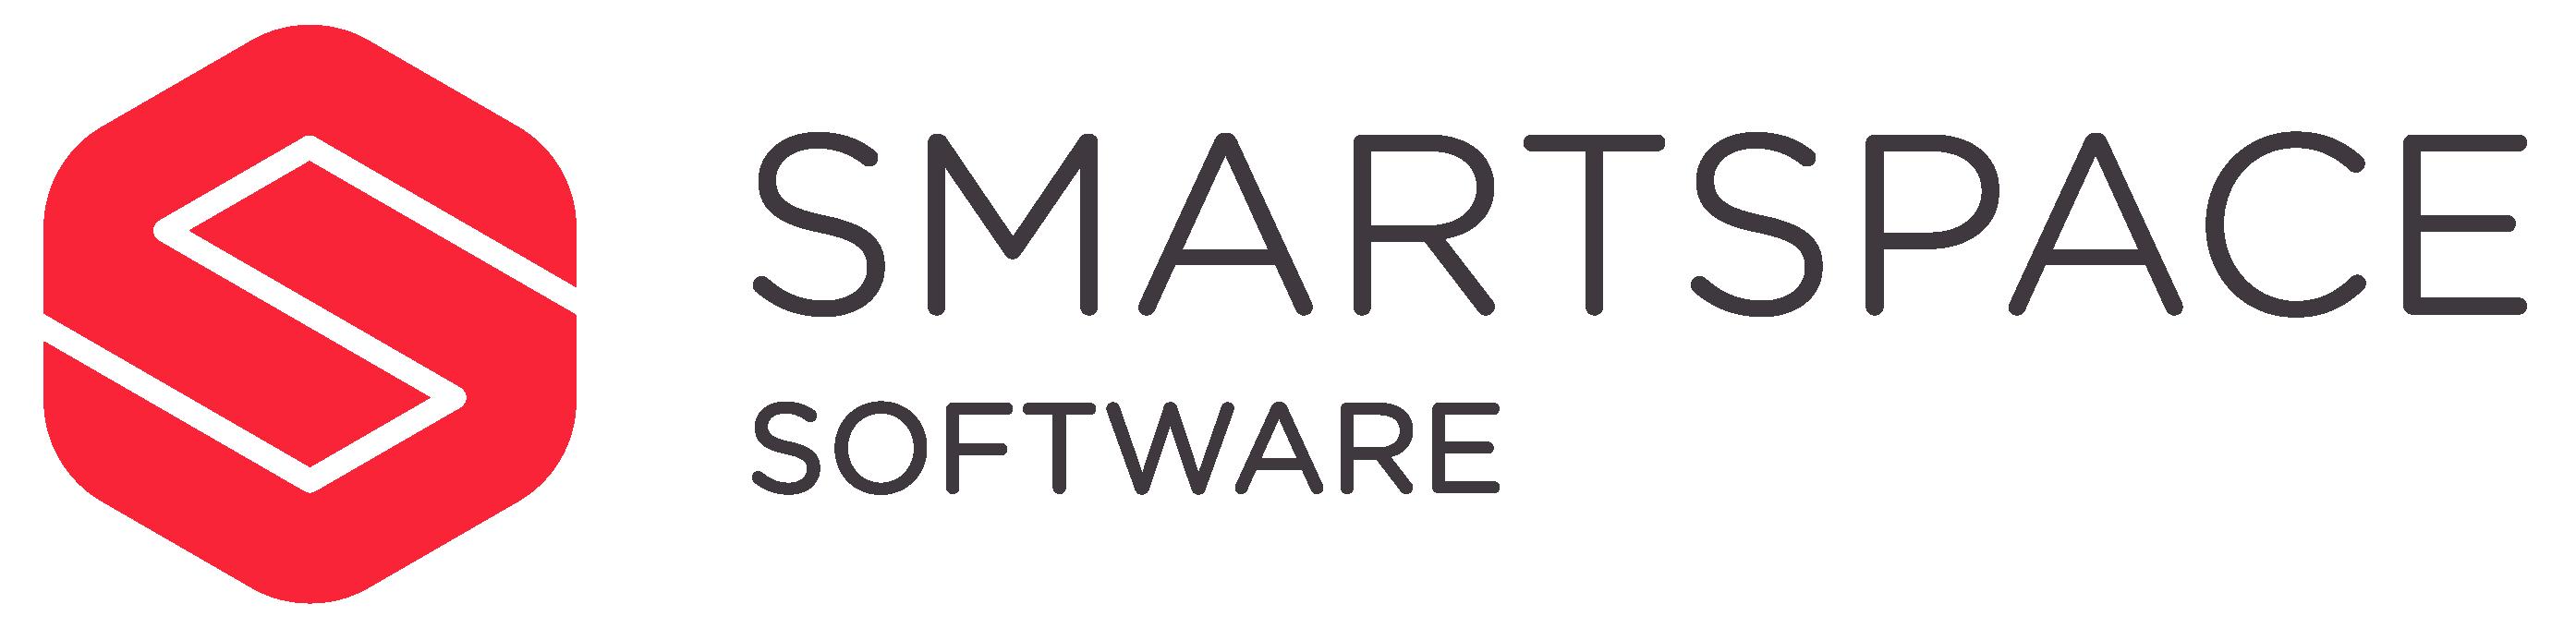 Smartspace Software PLC Logo